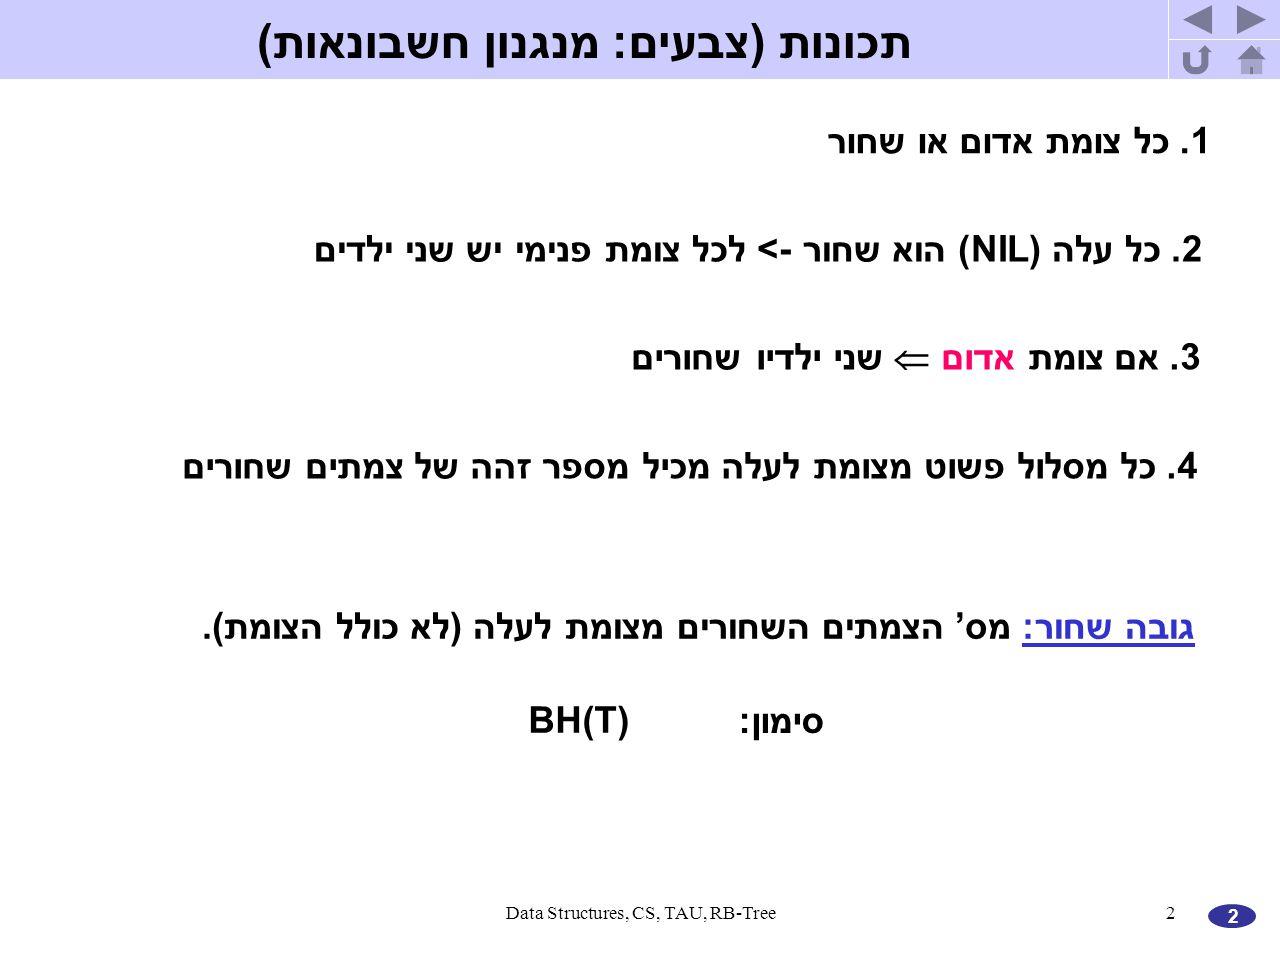 2 Data Structures, CS, TAU, RB-Tree2 1. כל צומת אדום או שחור 2.